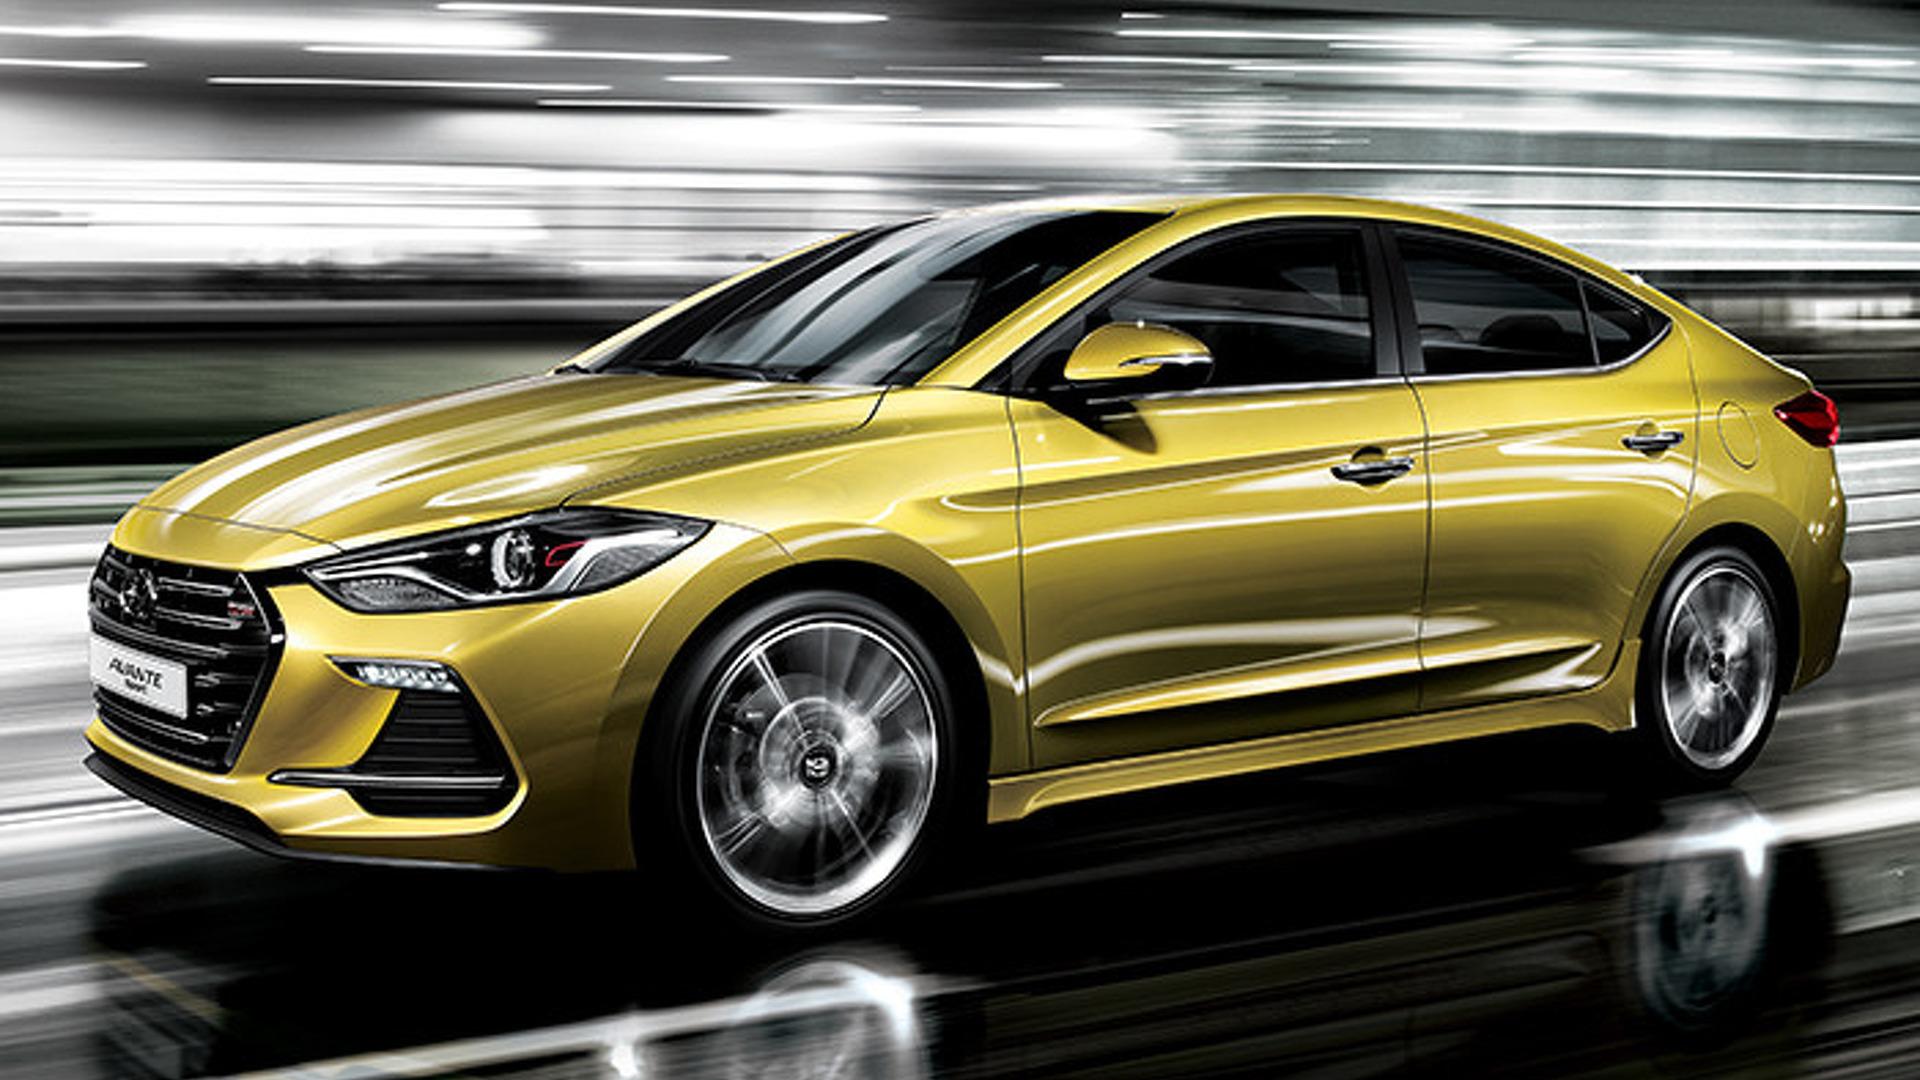 Say hello to the 2017 Hyundai Elantra Sport with 200 hp